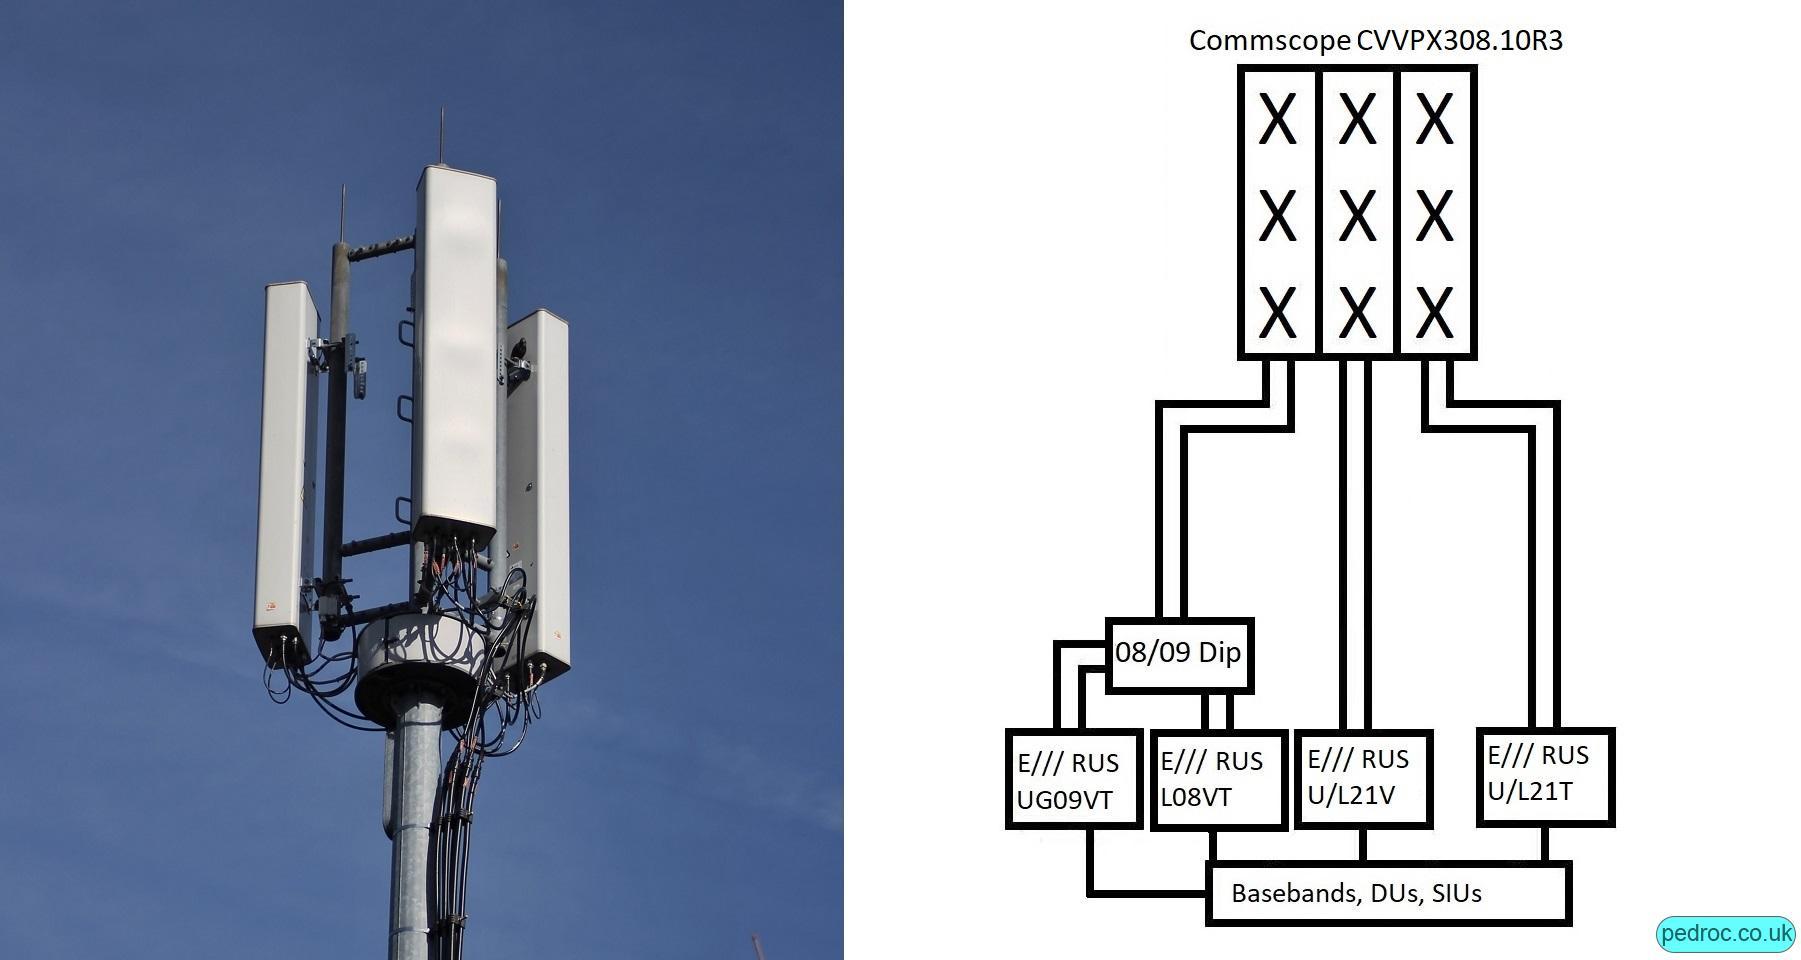 Medium capacity configuration with Commscope CVVPX308.10R3 antennas. Separate 2100MHz.